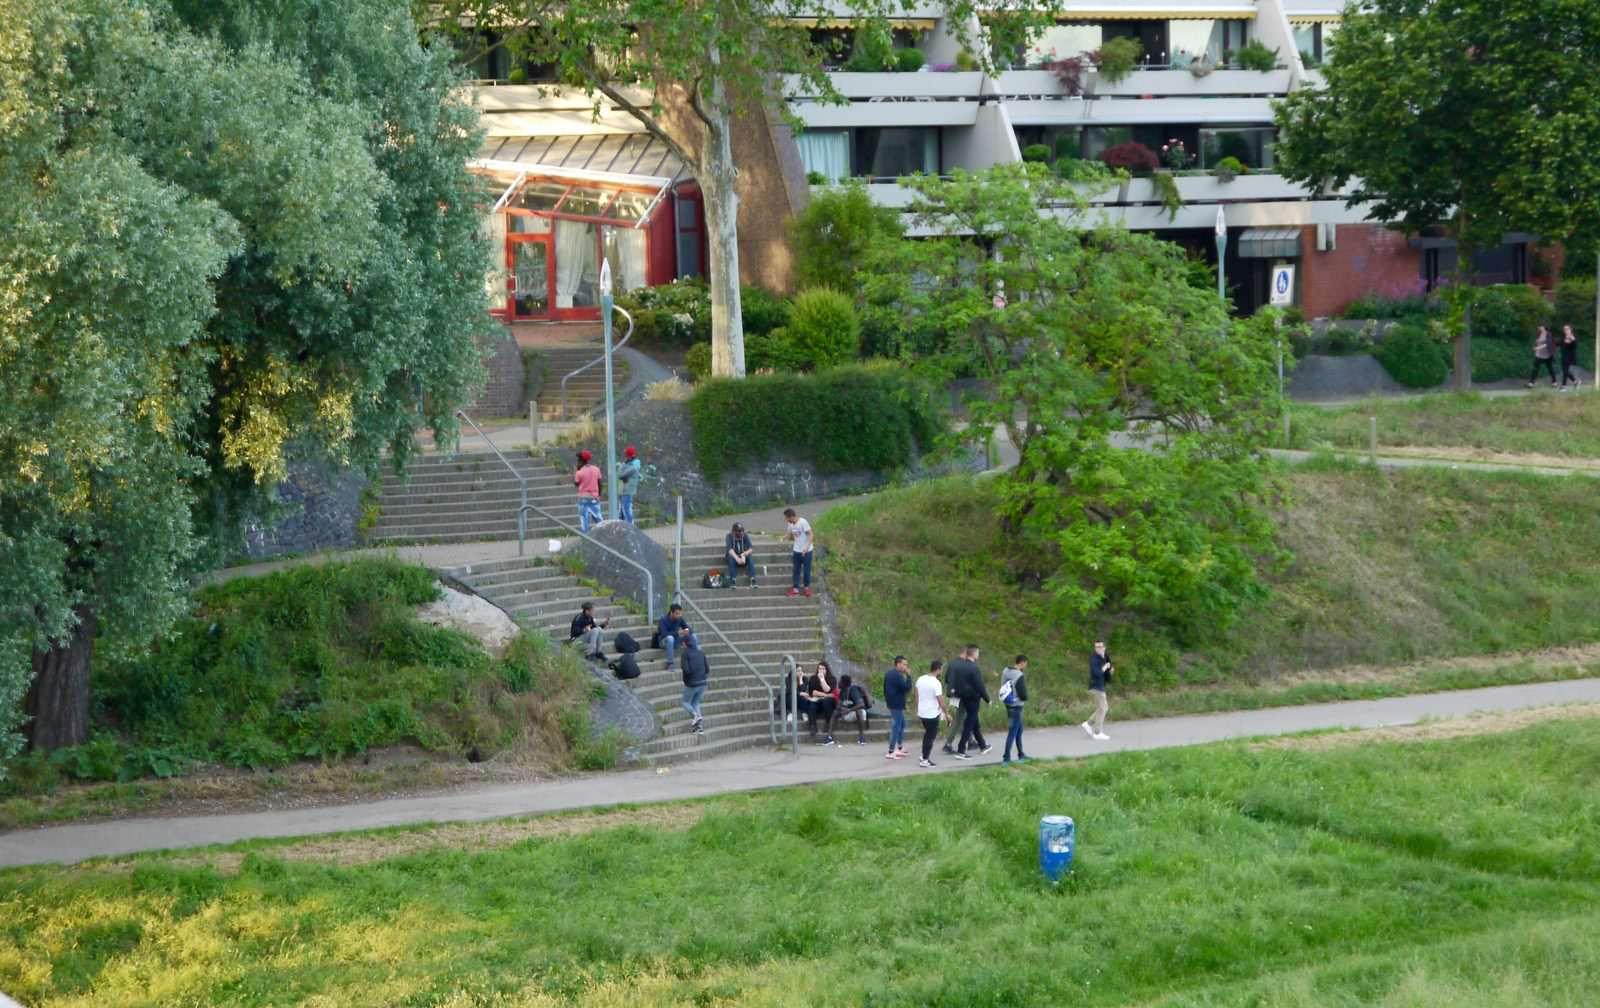 Aufenthaltsort Treppenabgang zum Neckarufer | Foto: M. Schülke